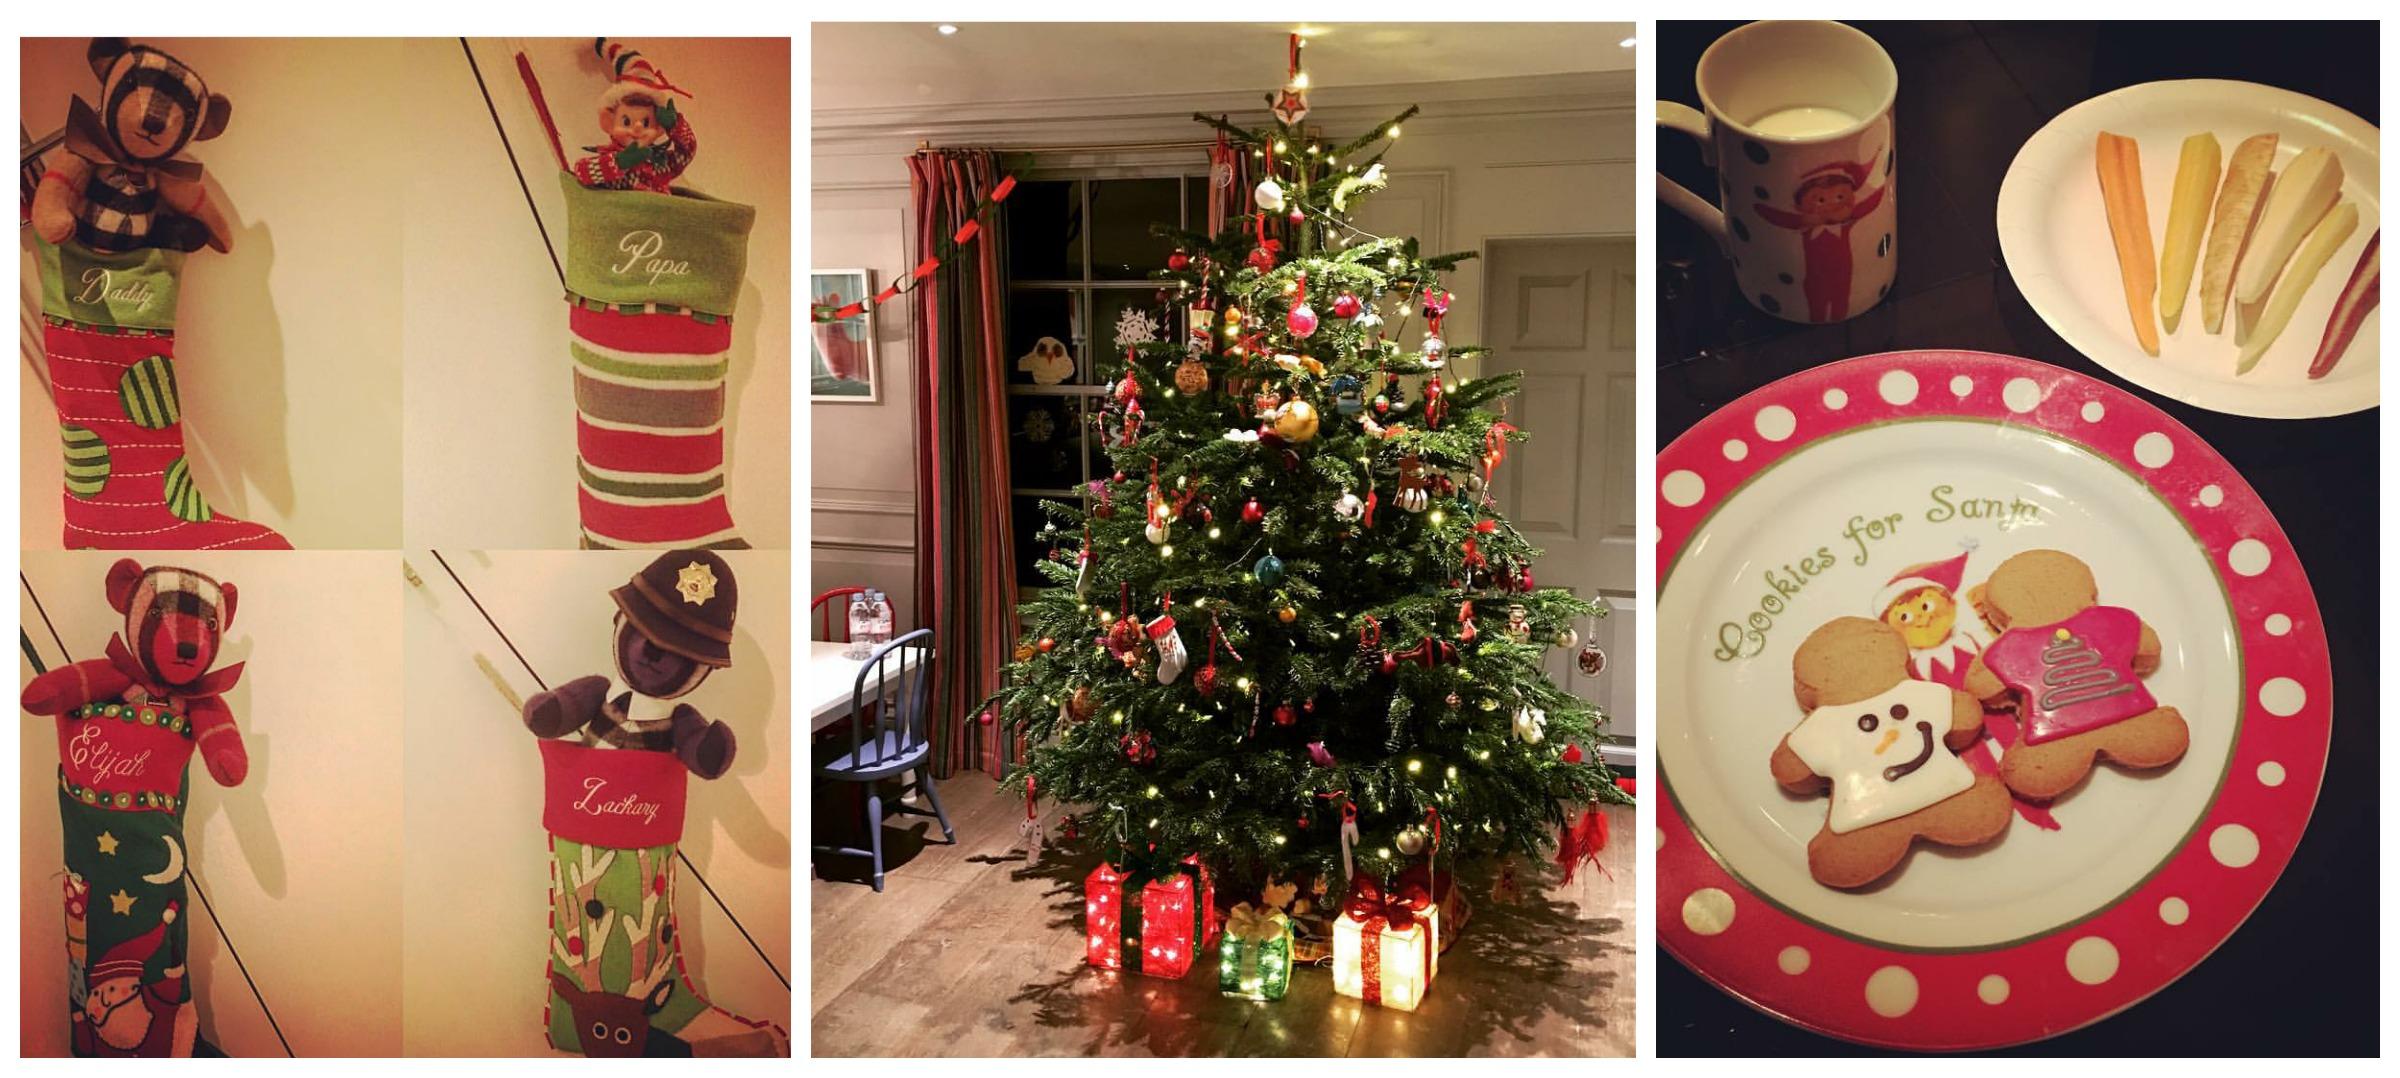 Elton John Christmas Ornament.Elton John So Sue Me